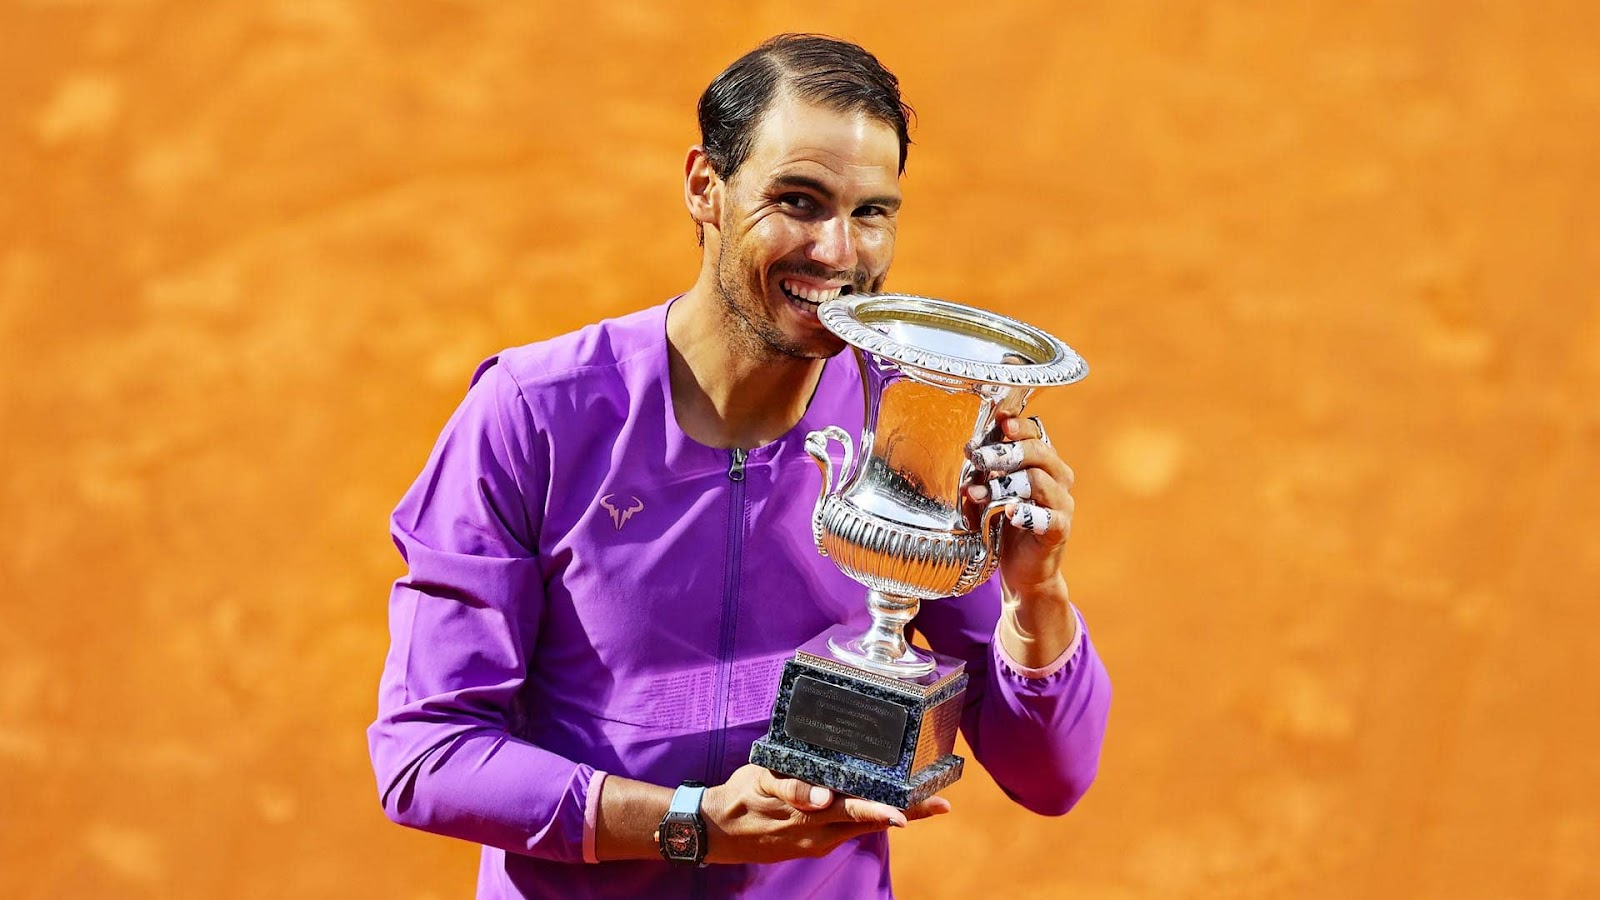 Rafael Nadal winning the French Open trophy in 2020